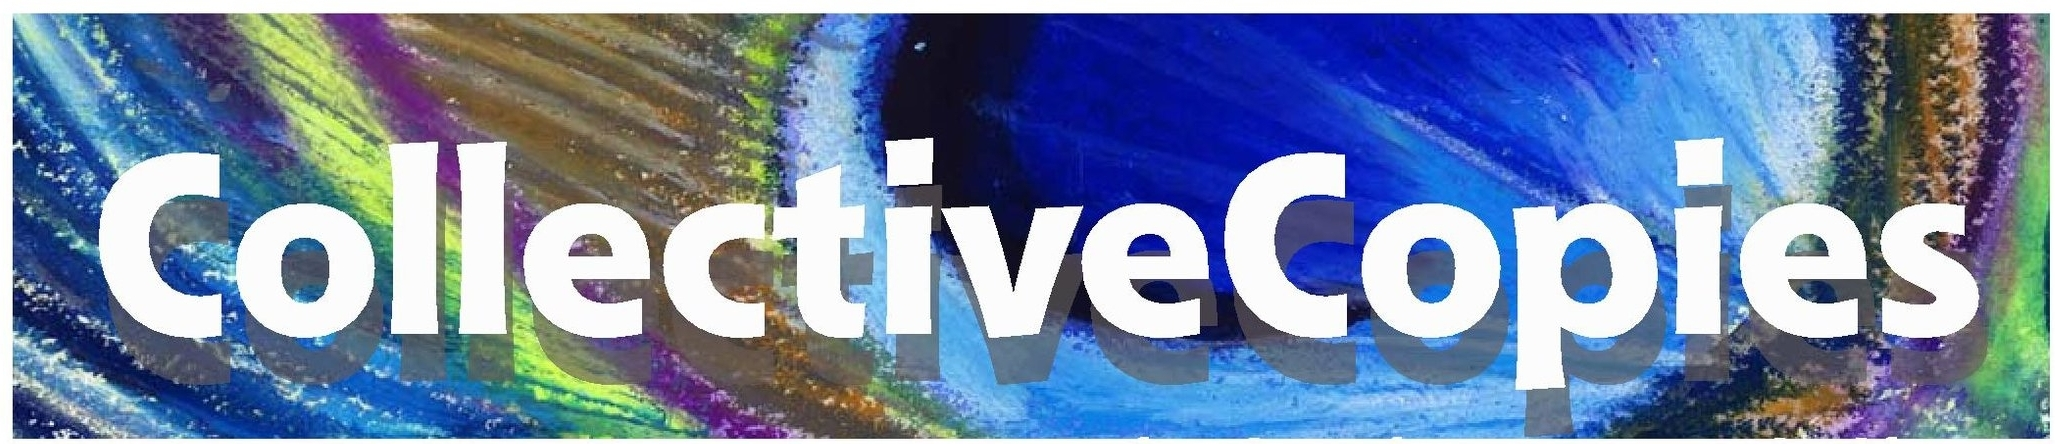 Collective Copies logo-page-001.jpg